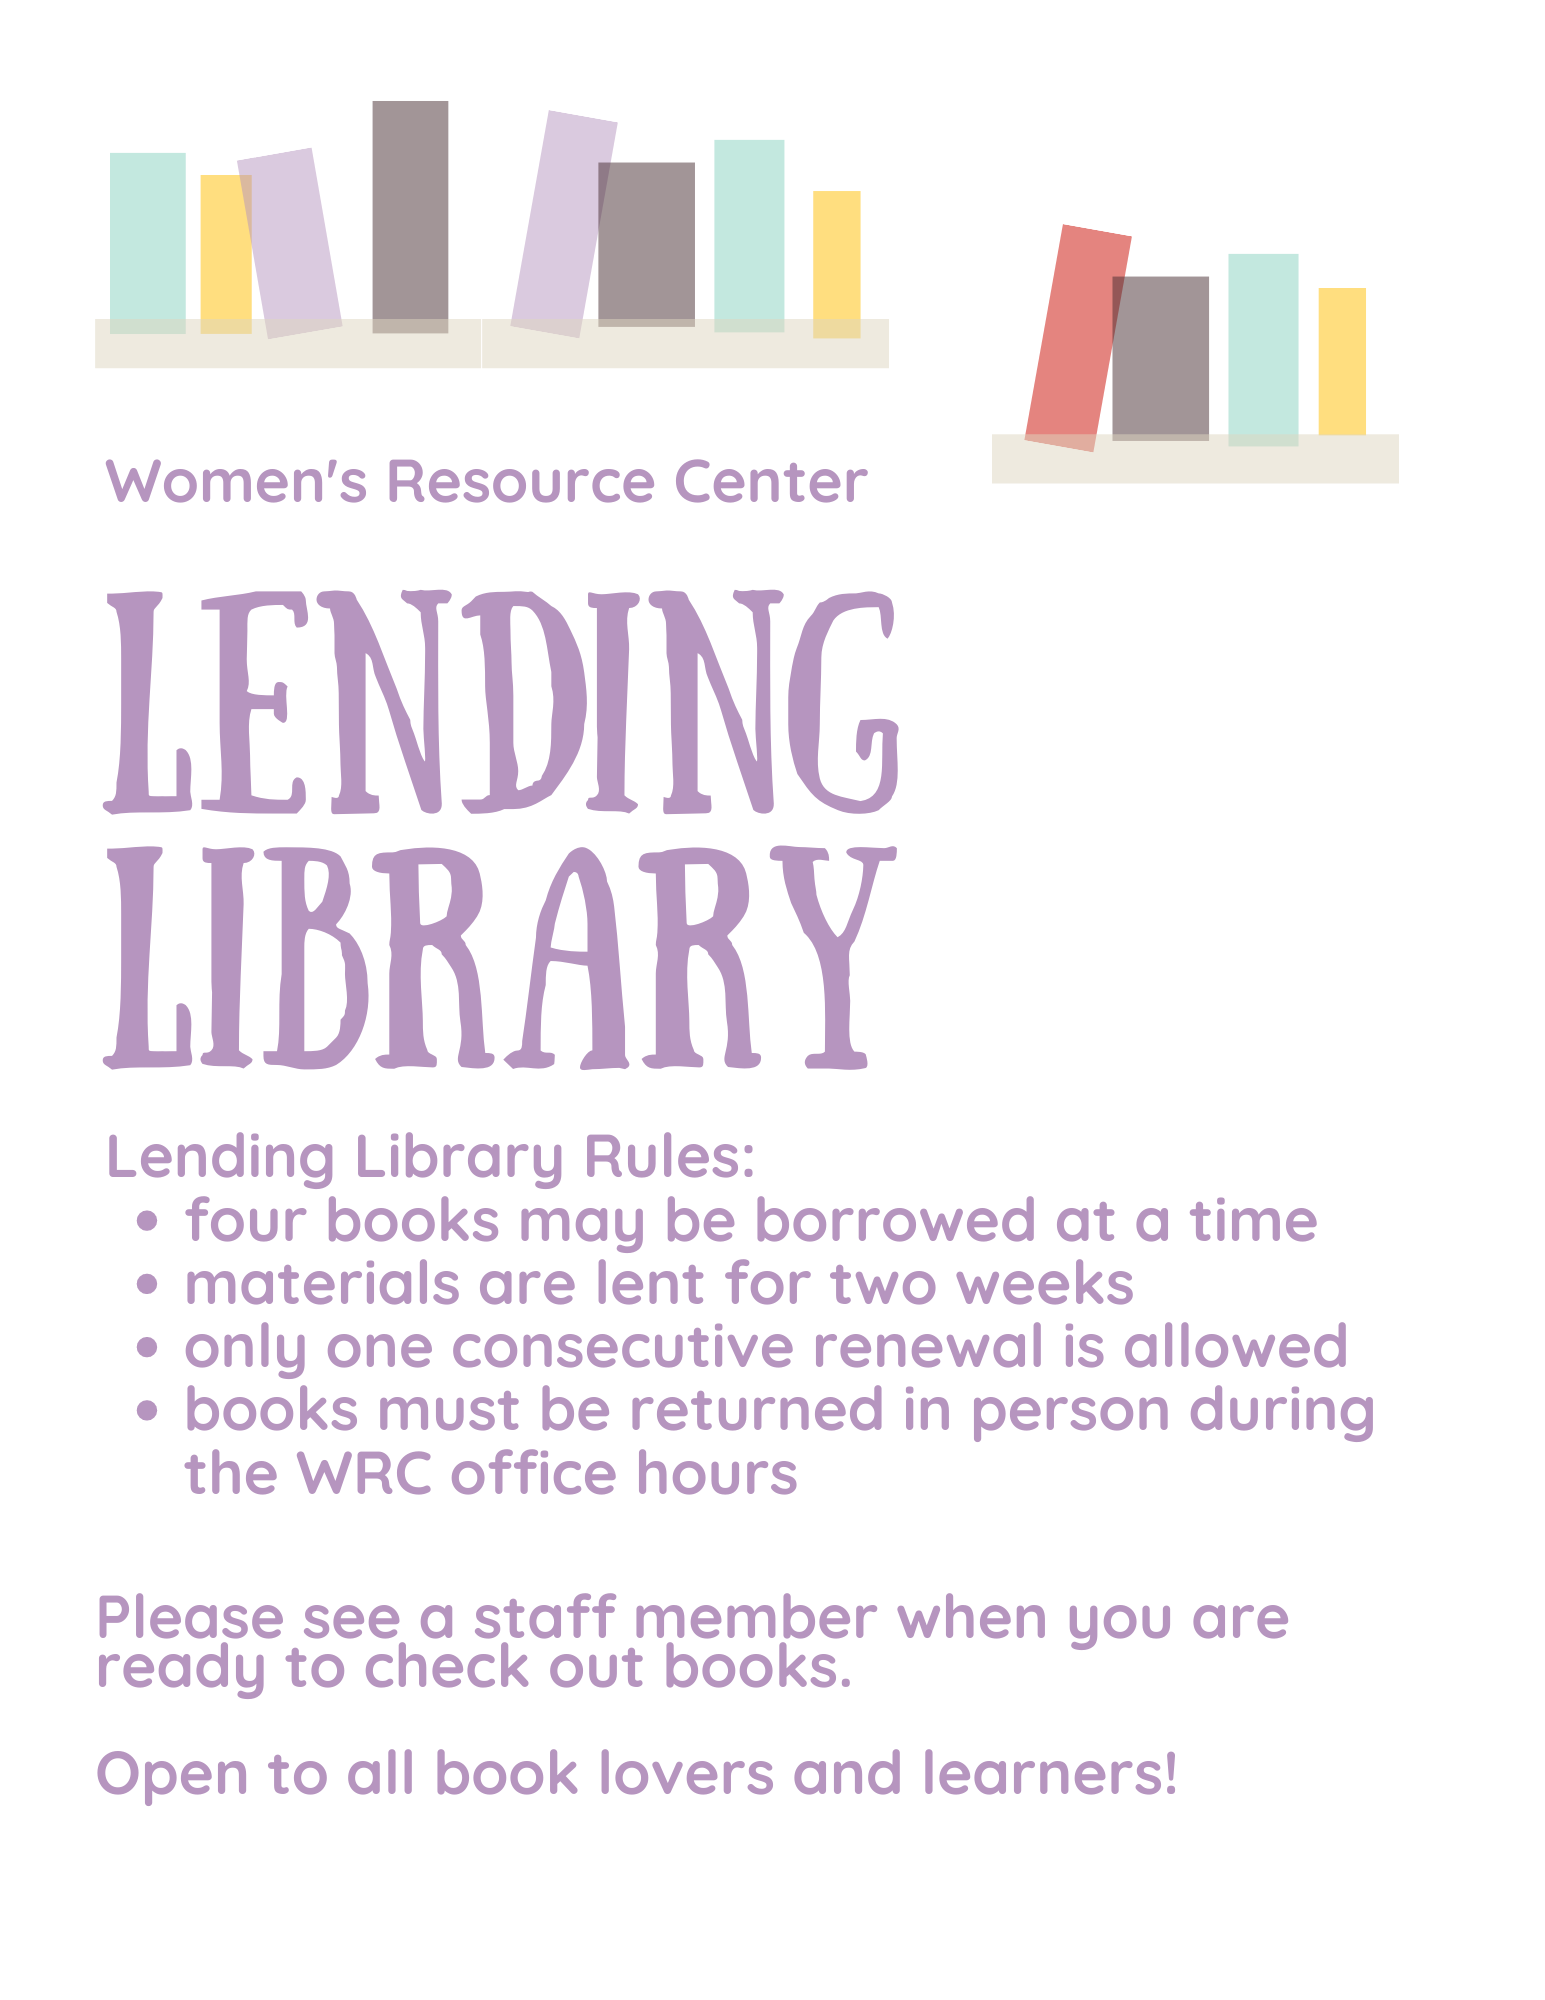 Women's Resource Center Lending Library Rules